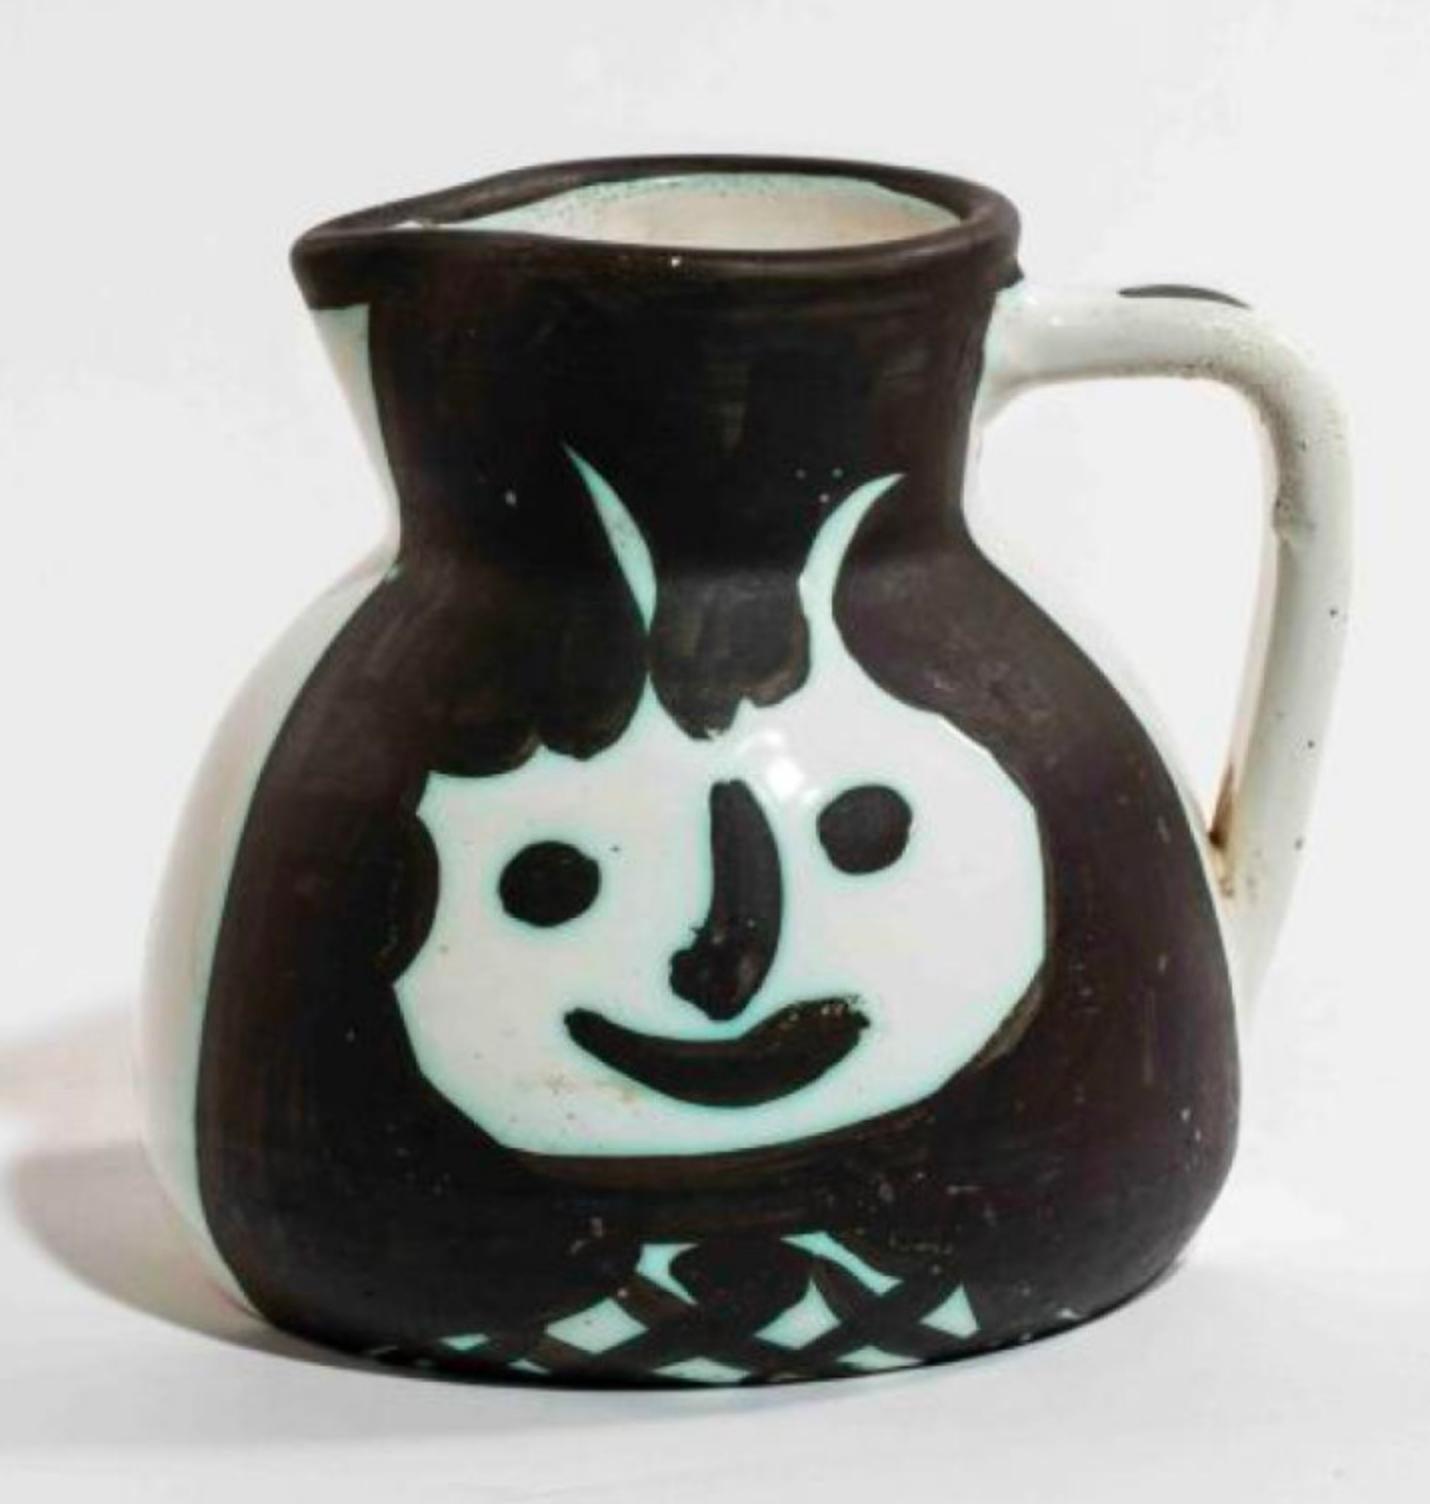 Pichet Têtes, Pablo Picasso, 1950's. Pitcher, Ceramic, Design, Earthenware